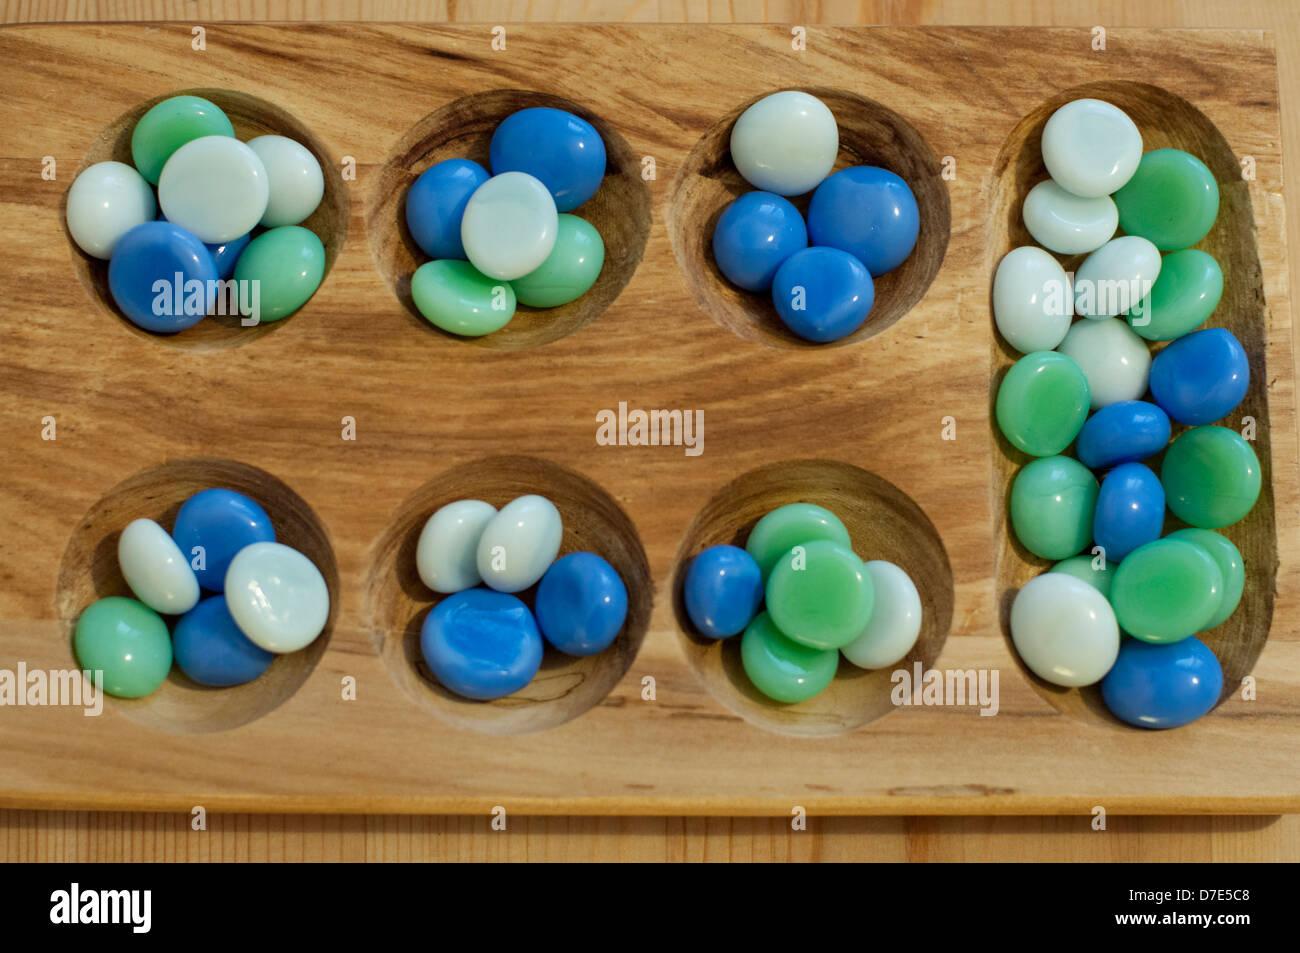 Mancala. Traditional board game. Stock Photo